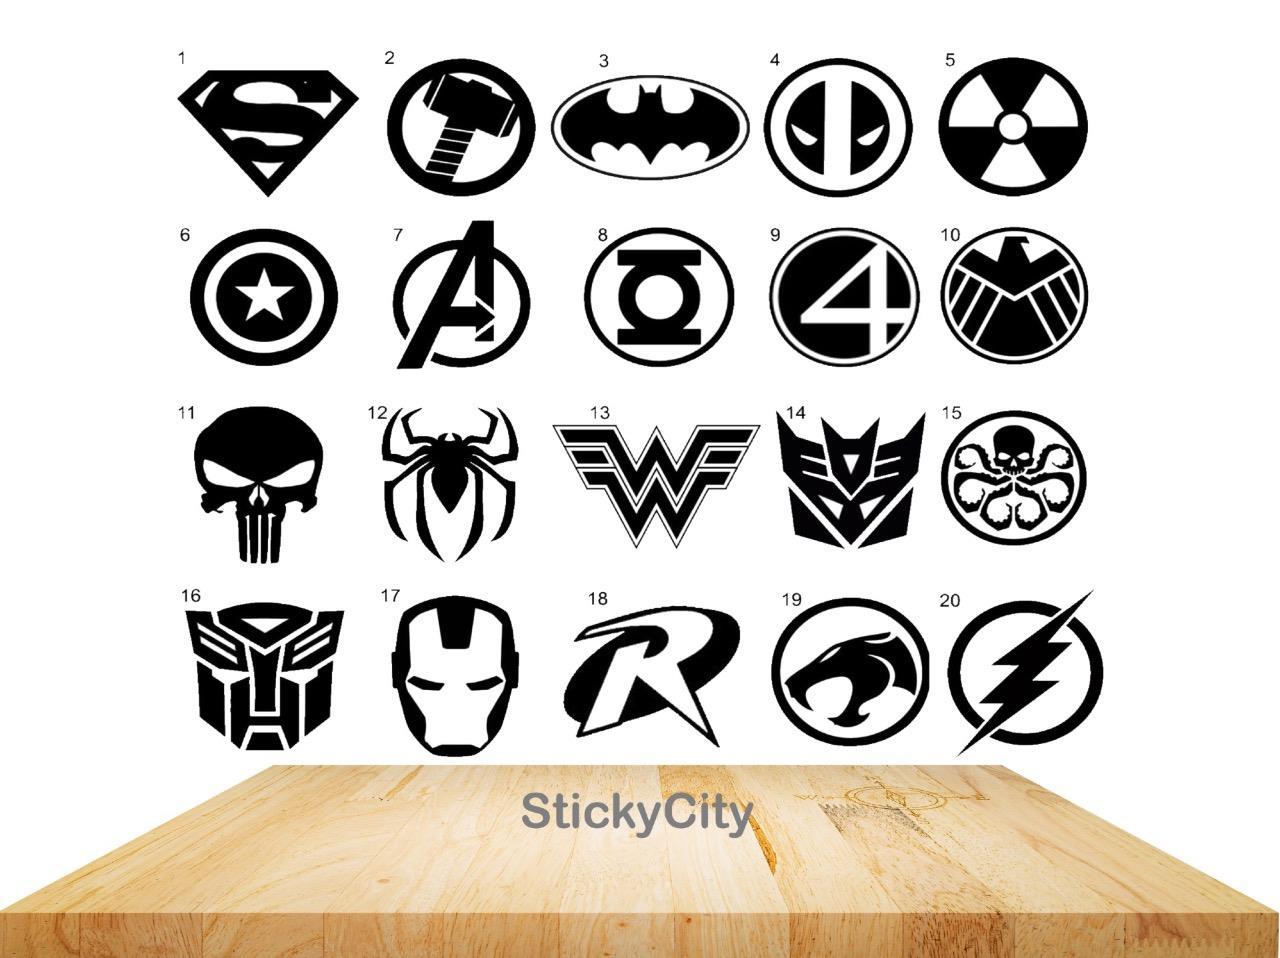 10cm-Superhero-Marvel-Vinyl-Decal-Sticker-Car-Window-Laptop-Kids-Bedroom-0211